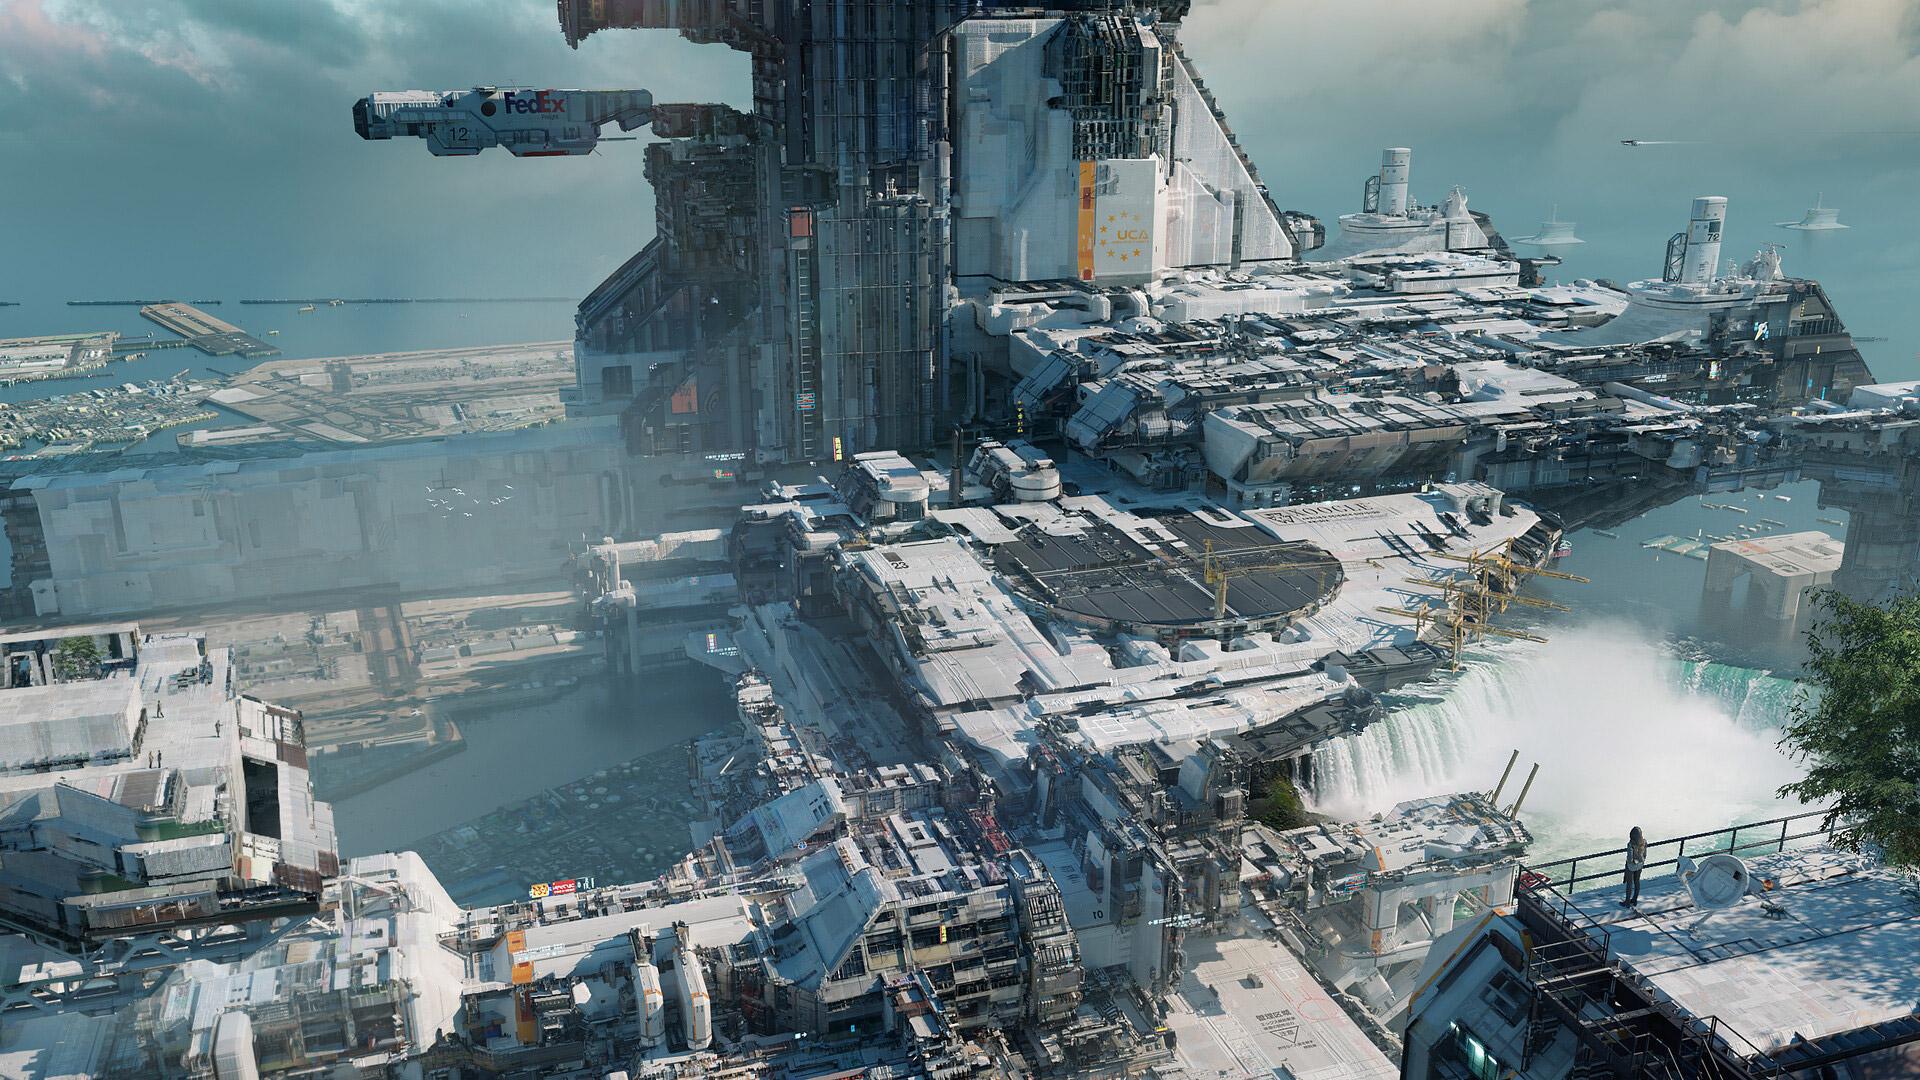 The Futuristic Science Fiction Art of Federico Pelat